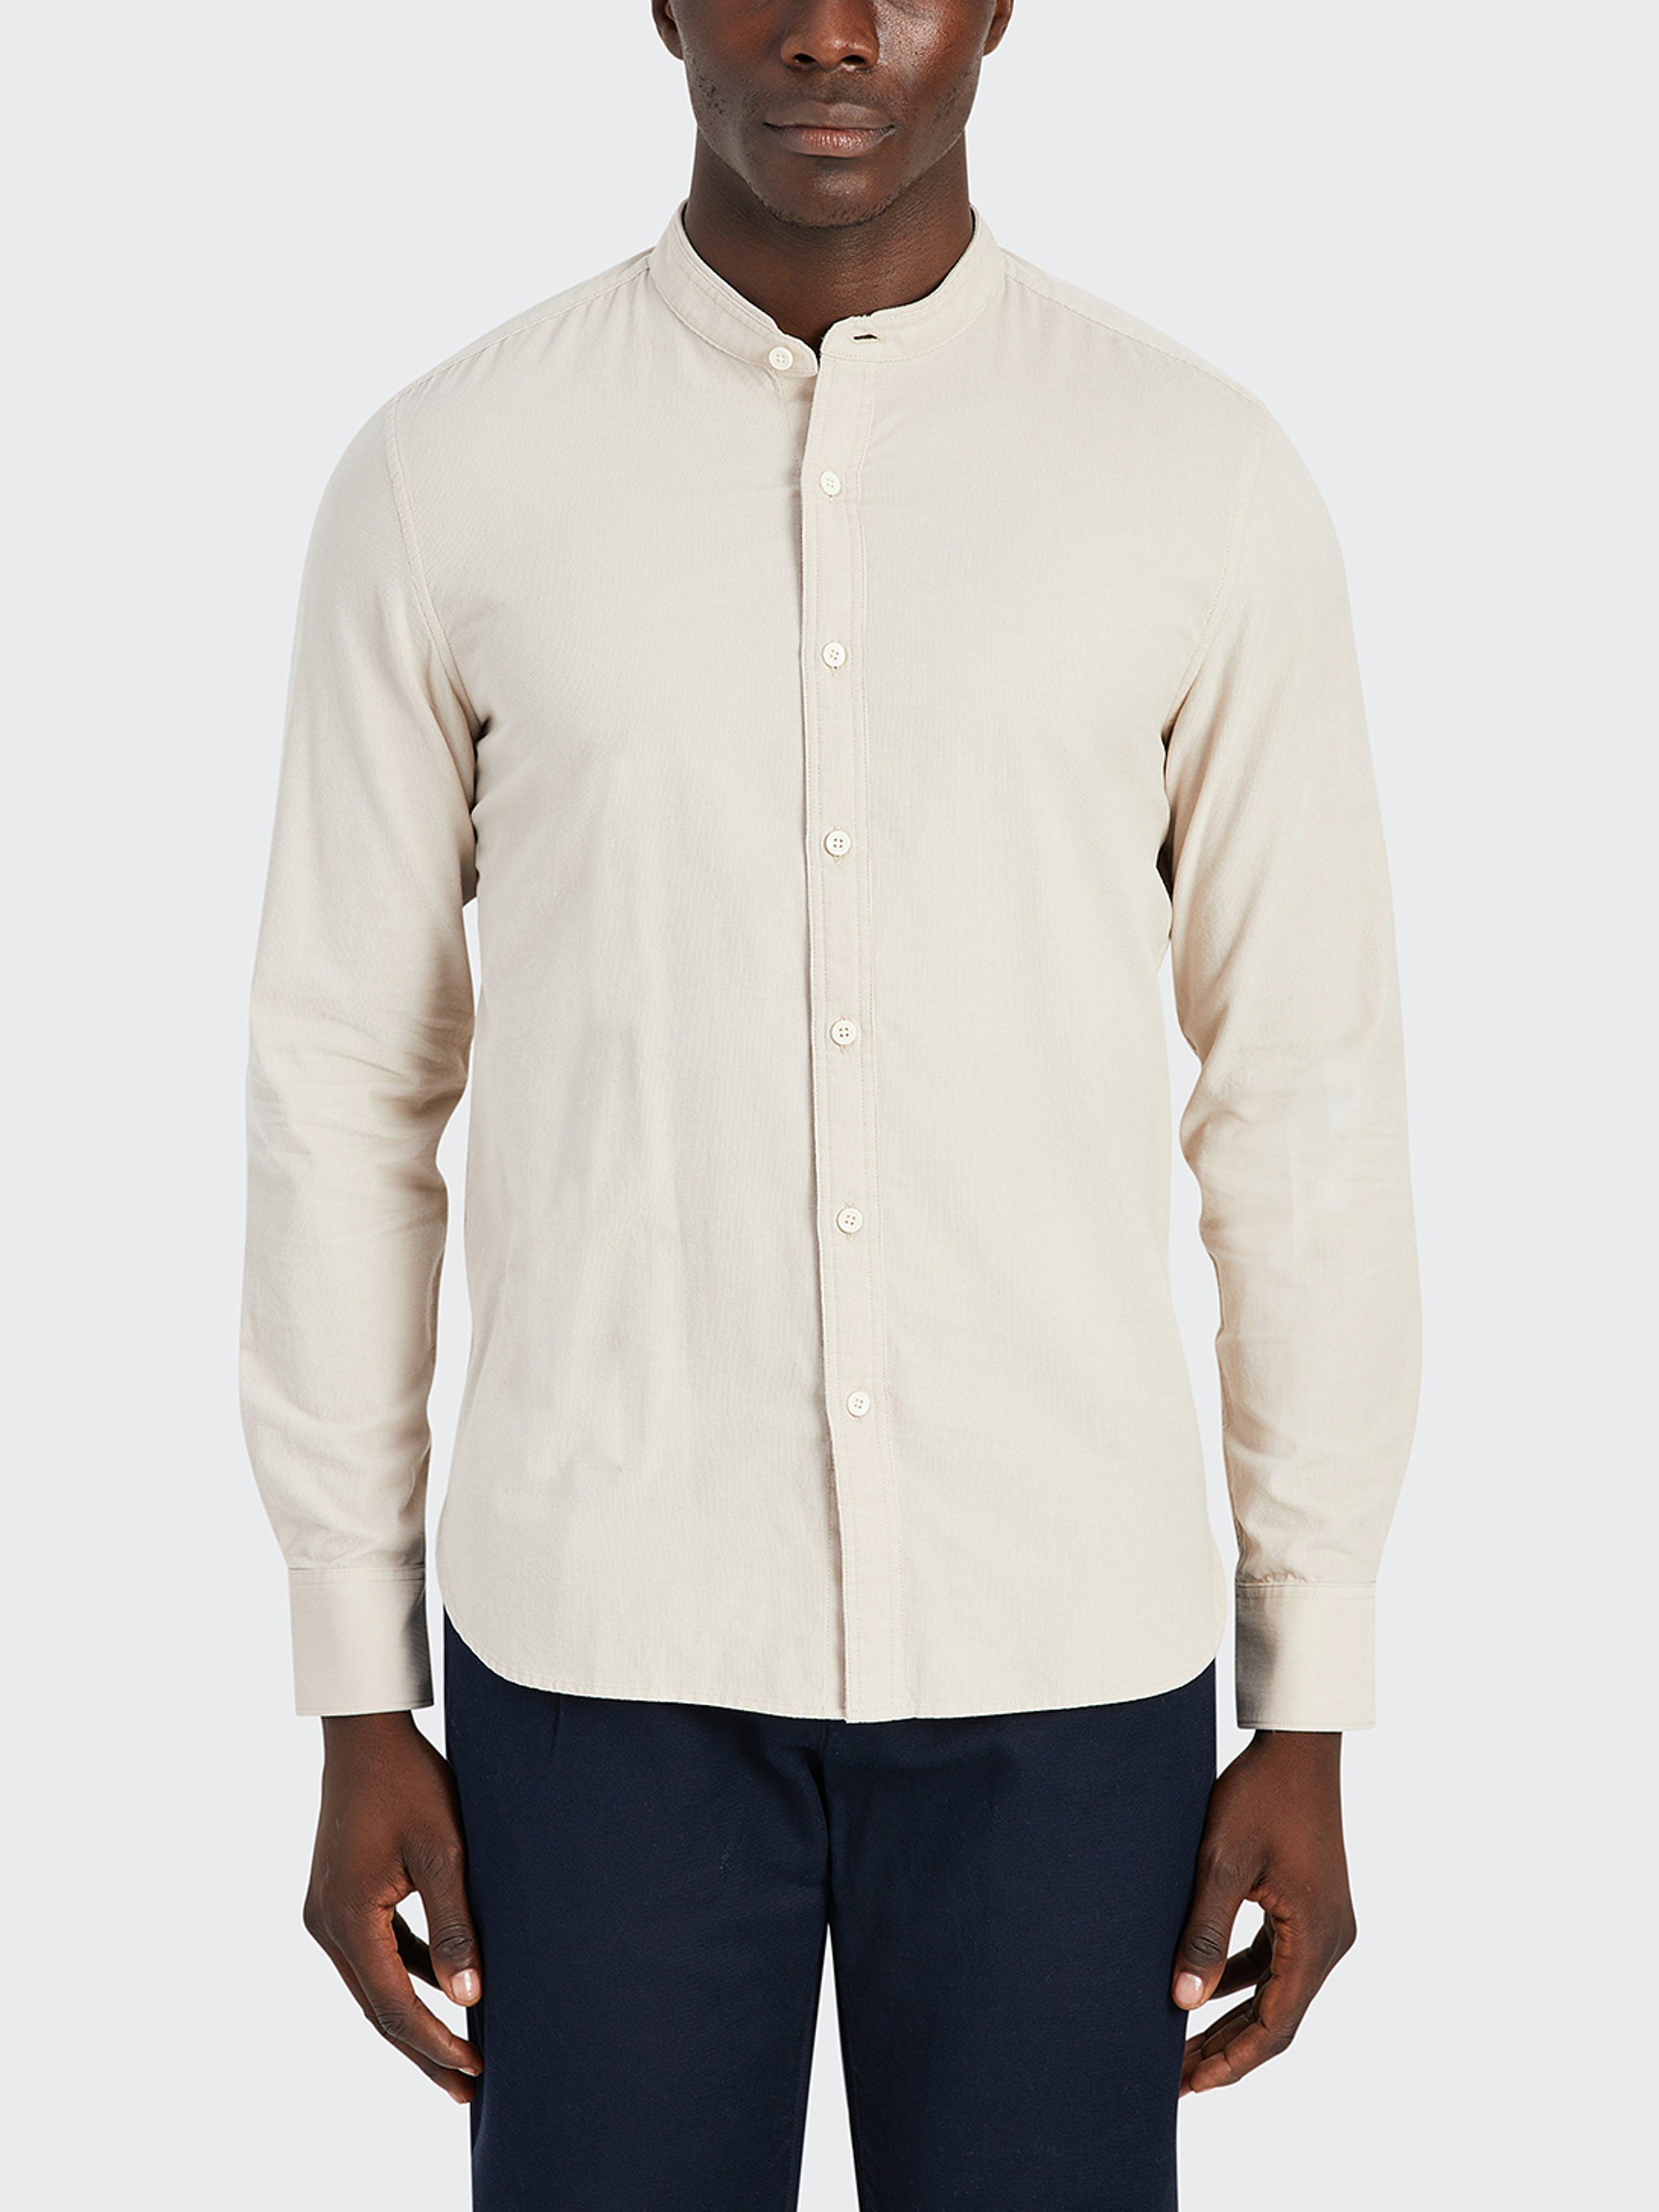 ONS Clothing Aleks Cord Shirt  - White